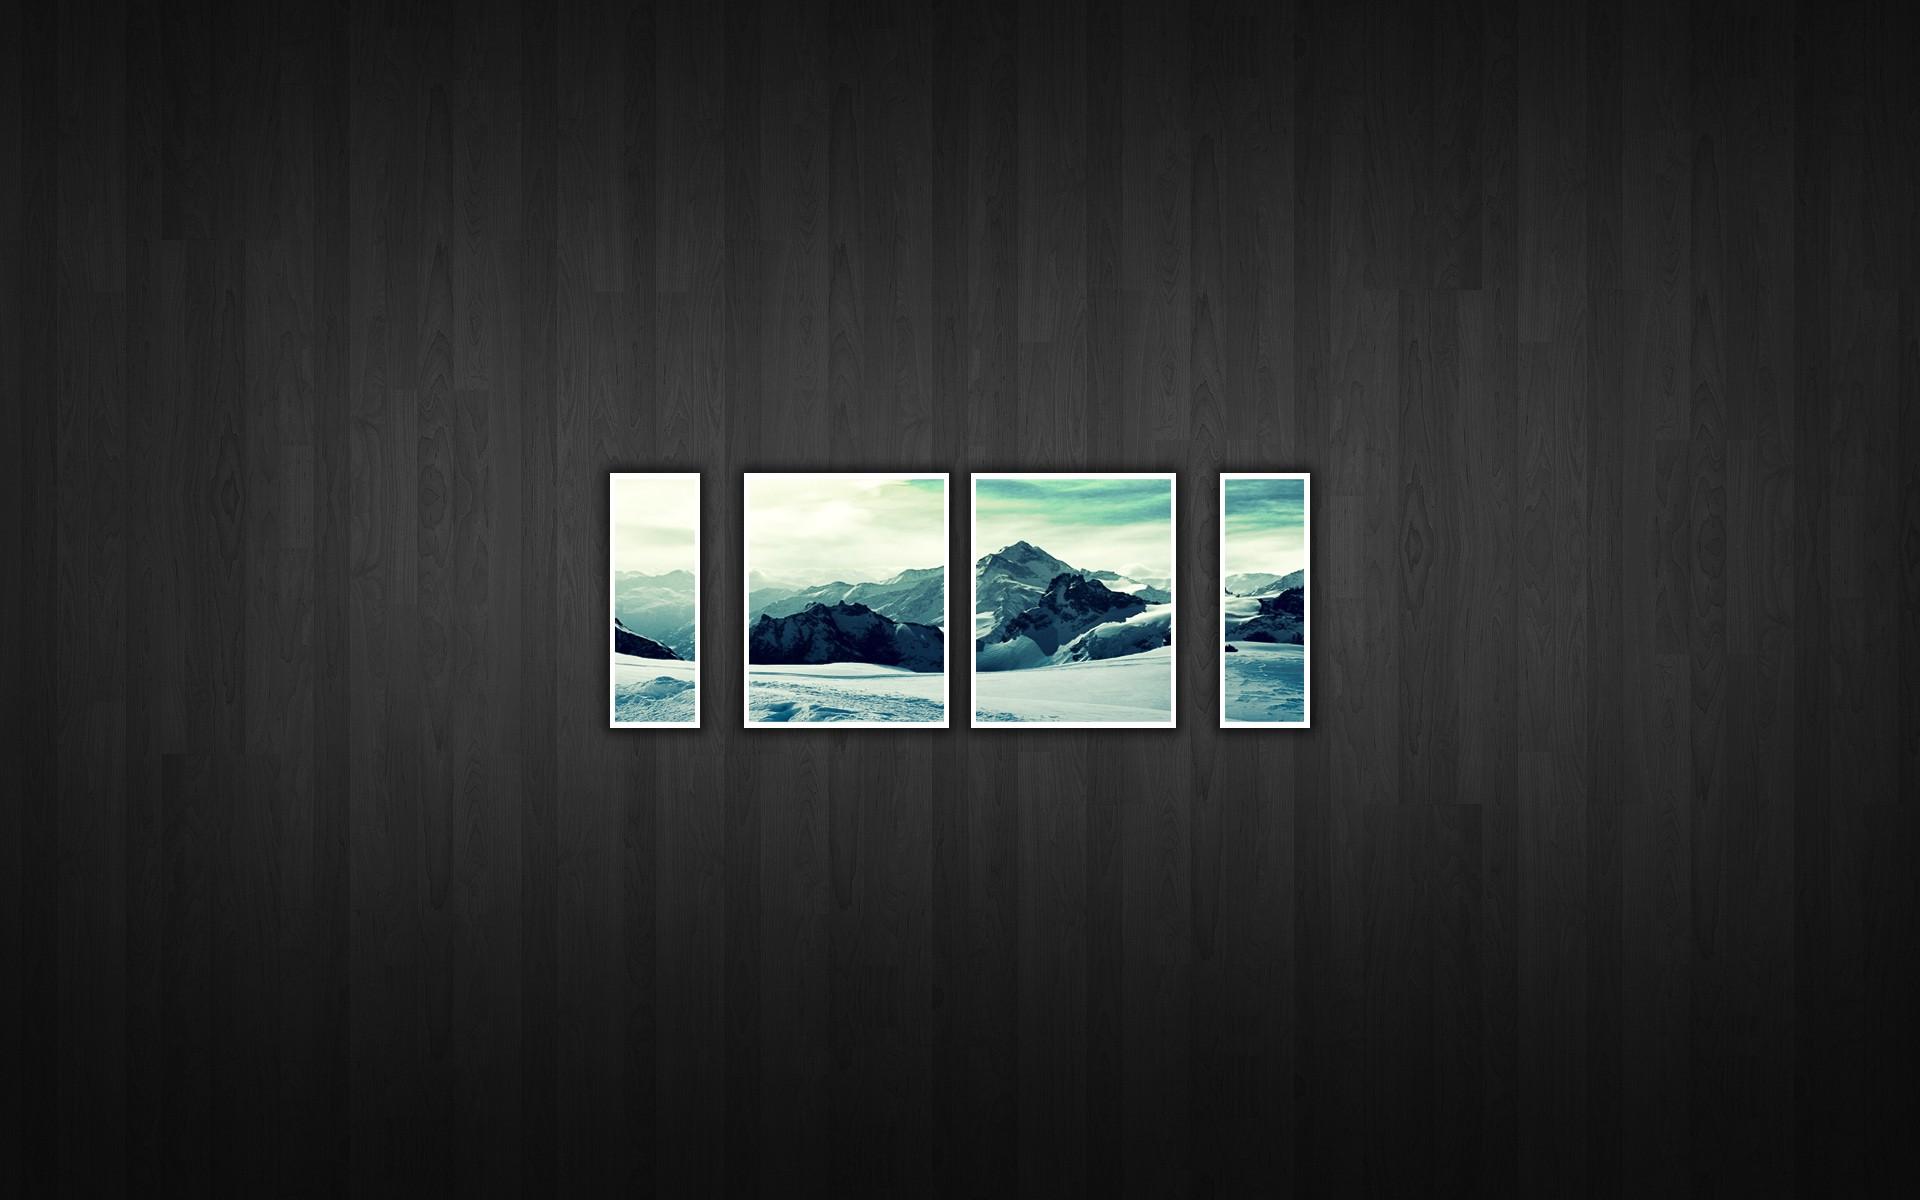 Full Screen Fall Wallpaper Clean Wallpapers Hd Pixelstalk Net